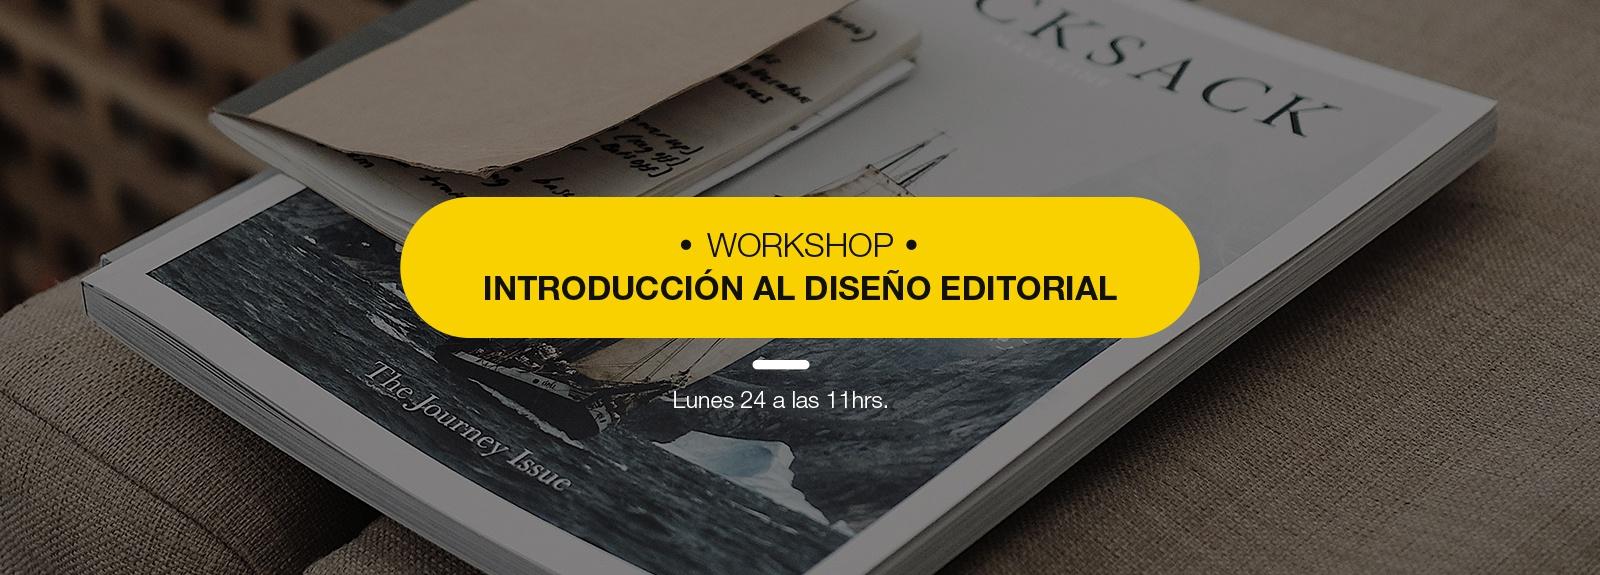 Workshop-Into-a-diseño-editorial-web-cabecera